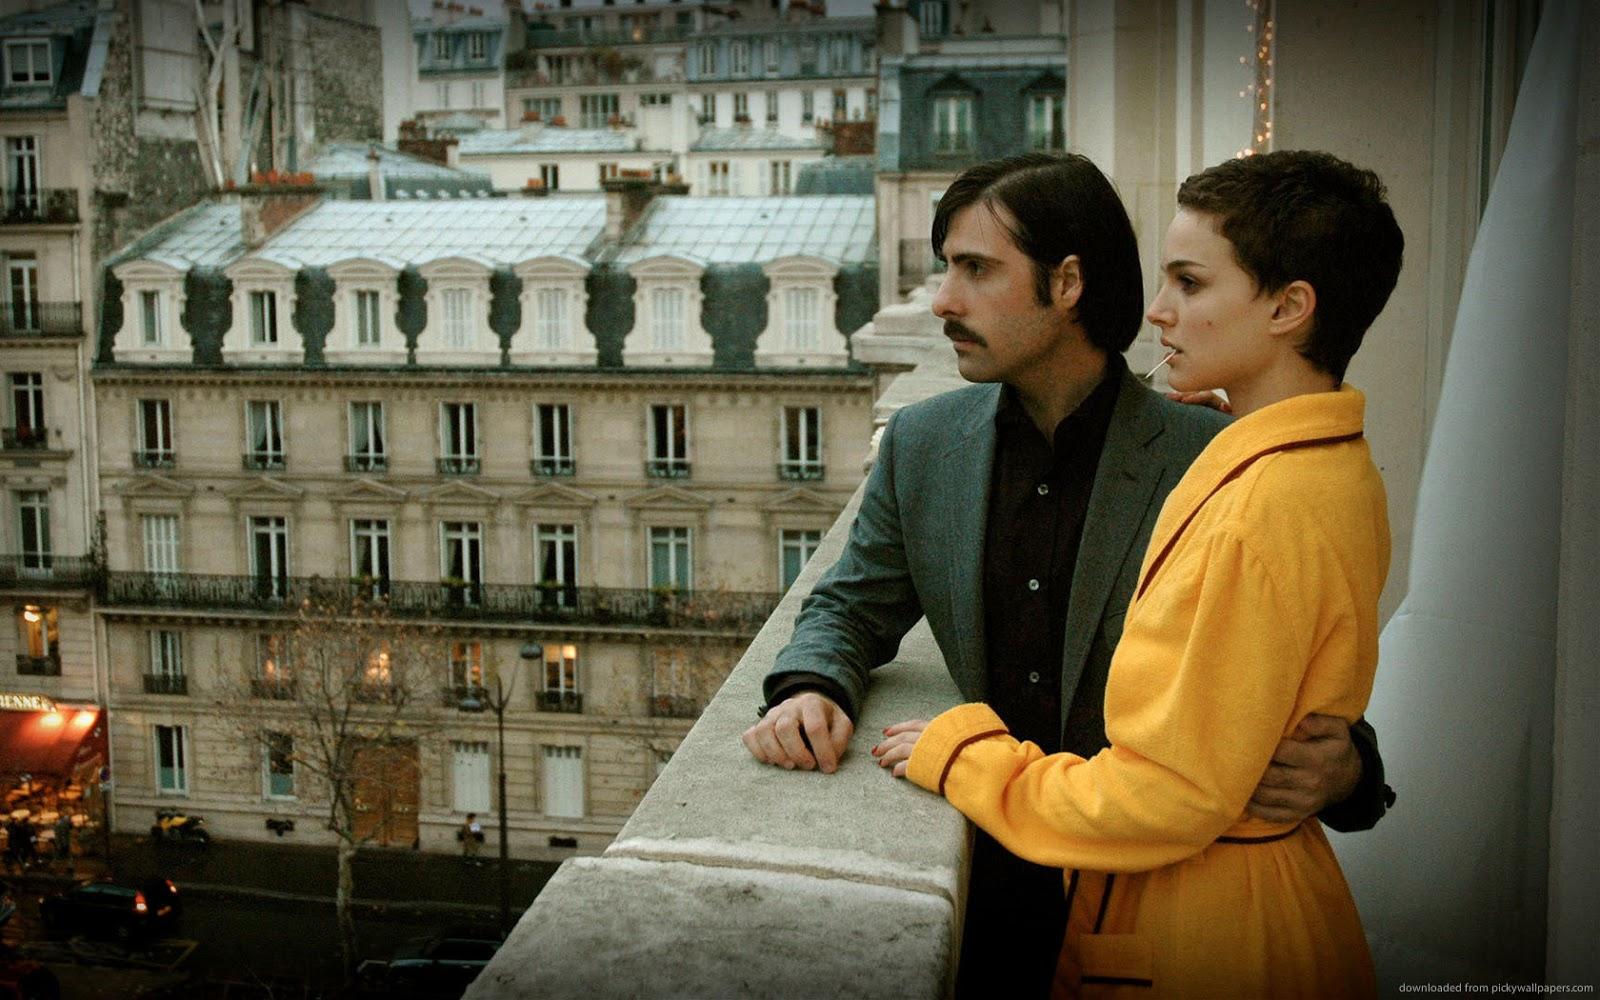 Hotel chevalier imdb